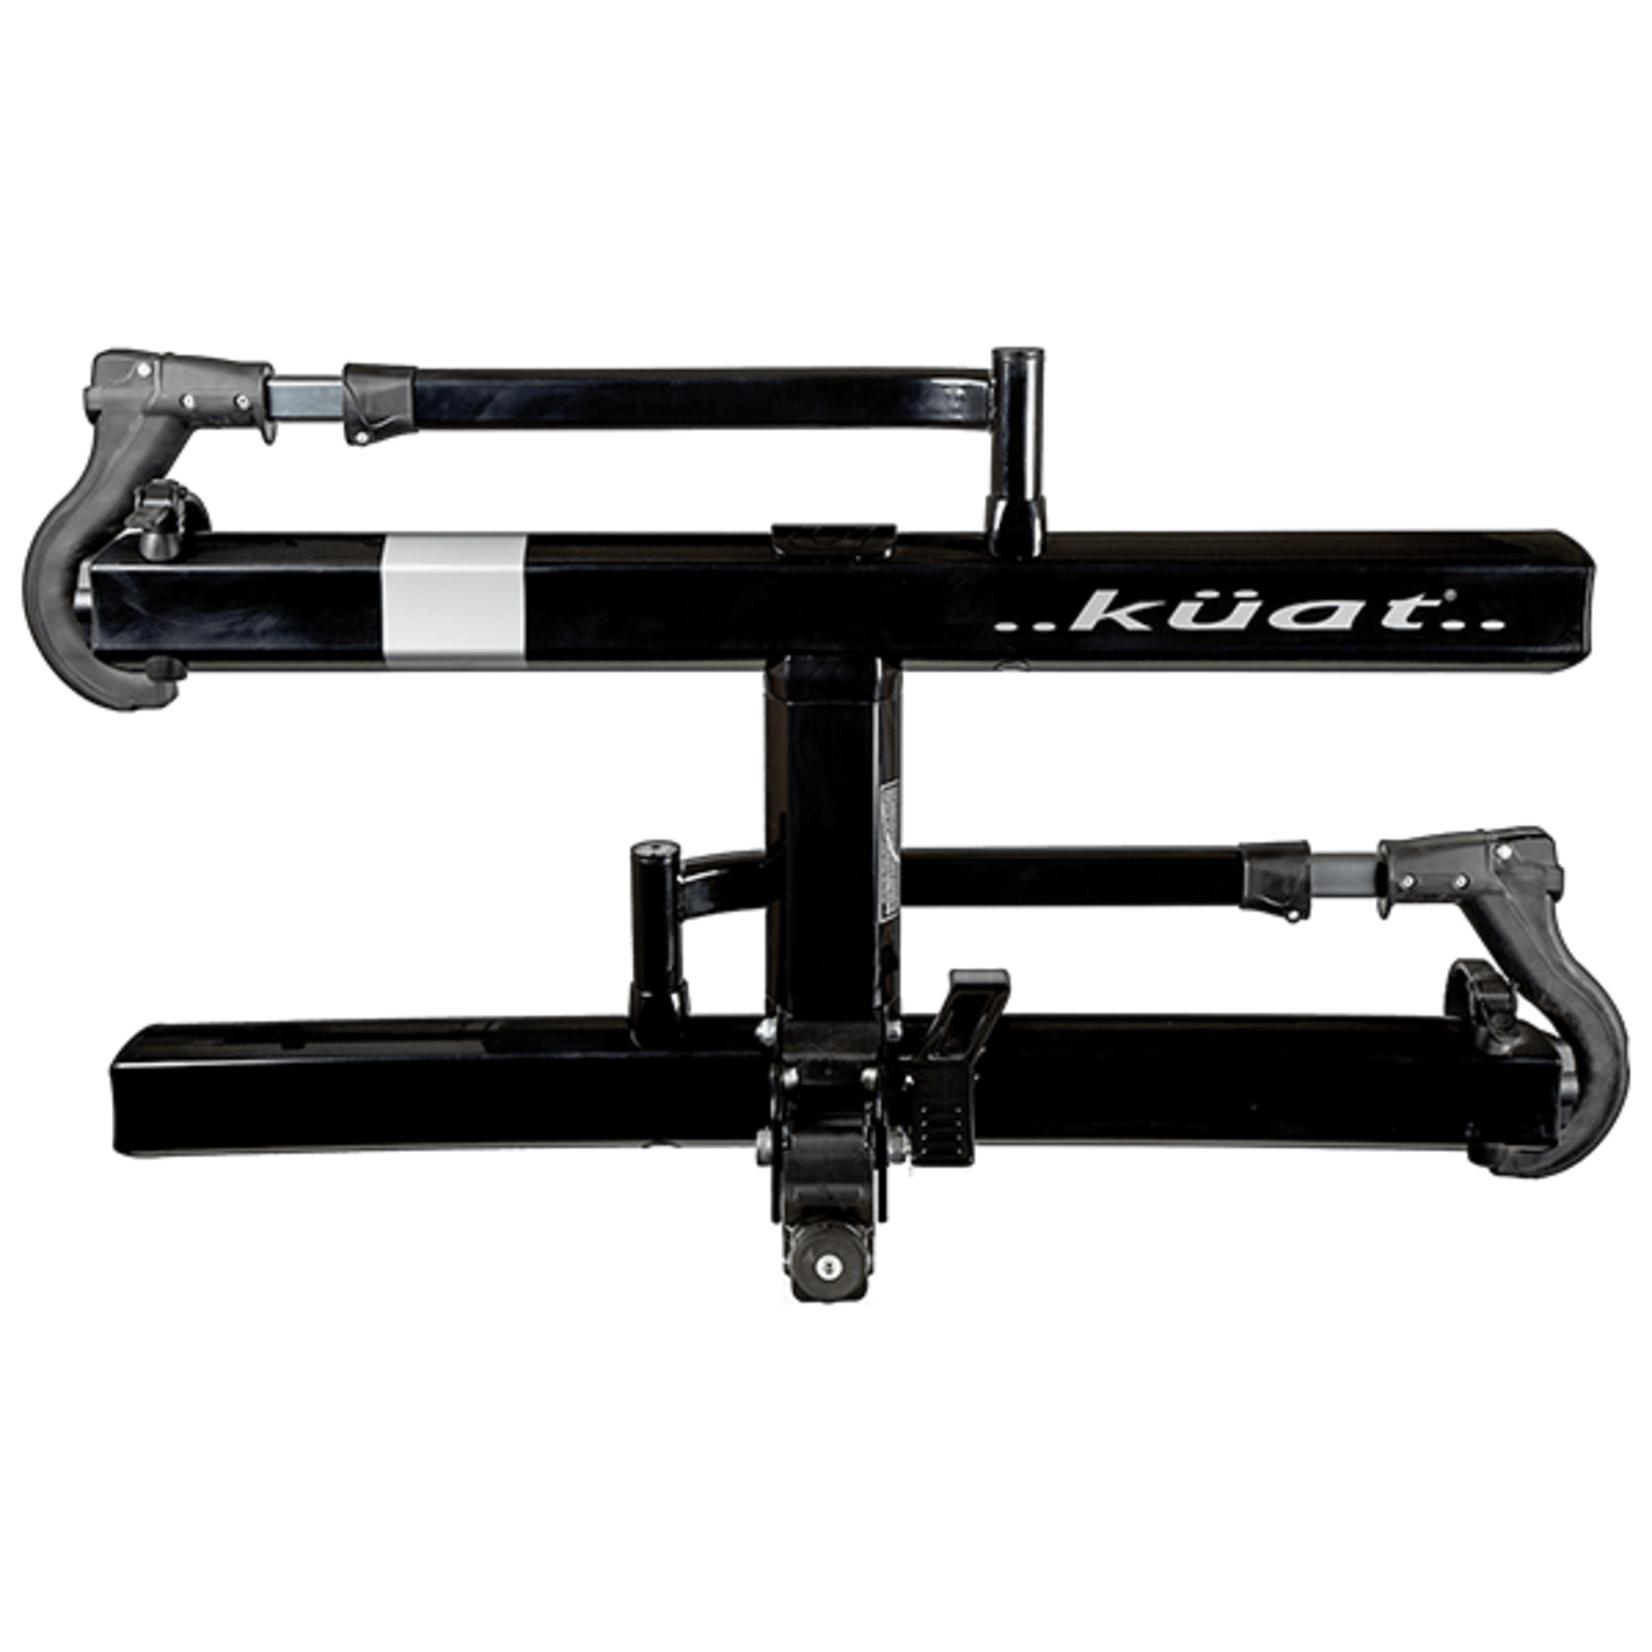 "Kuat Racks Sherpa 2.0 - 2"" - 2-Bike Rack"